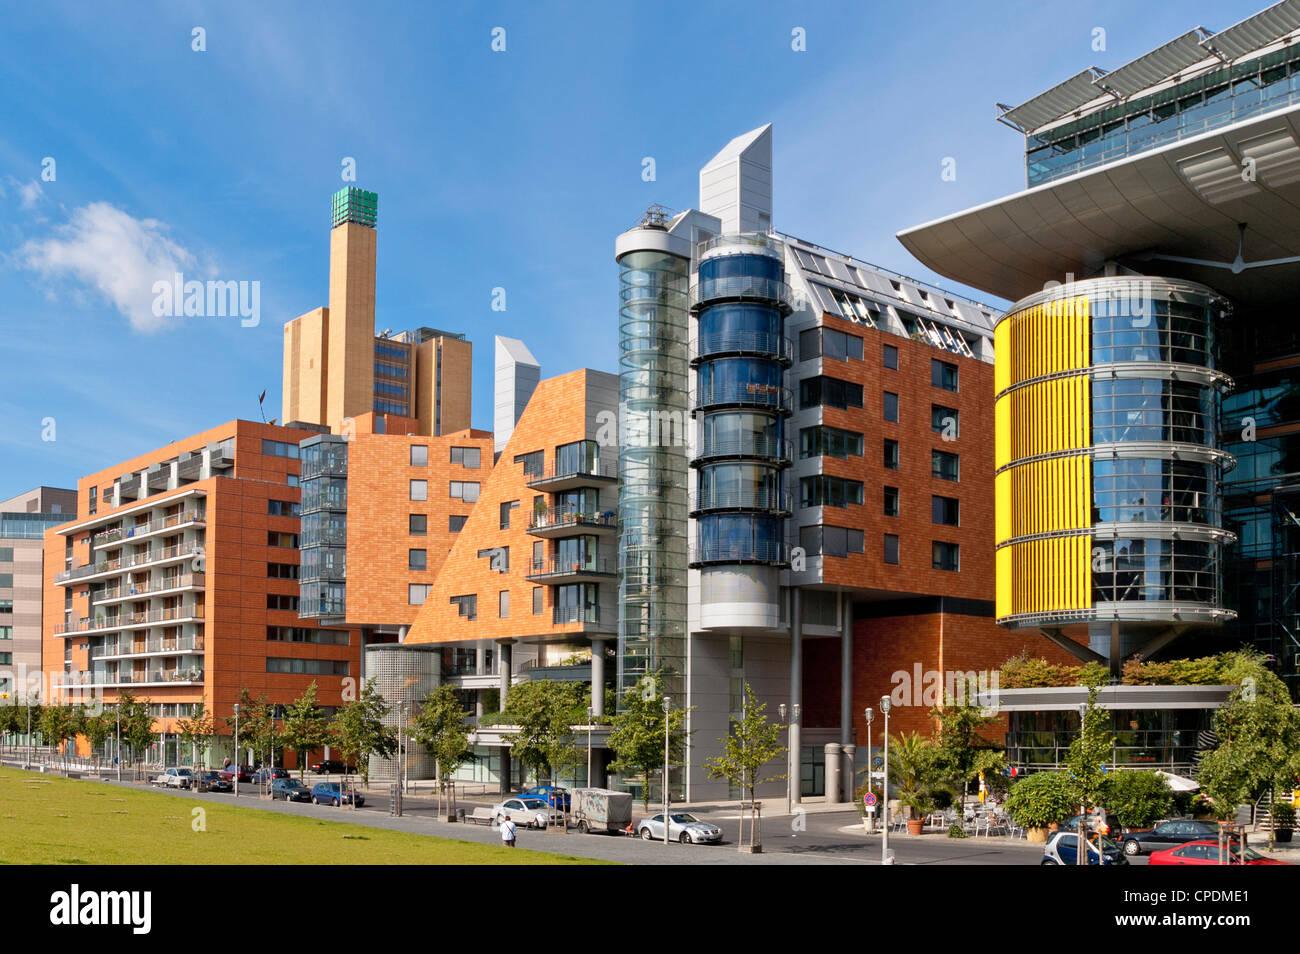 Daimler oficinas, comercios y residencias de arquitectura moderna de arquitecto en complejos Linkstrasse, Potsdamer Imagen De Stock